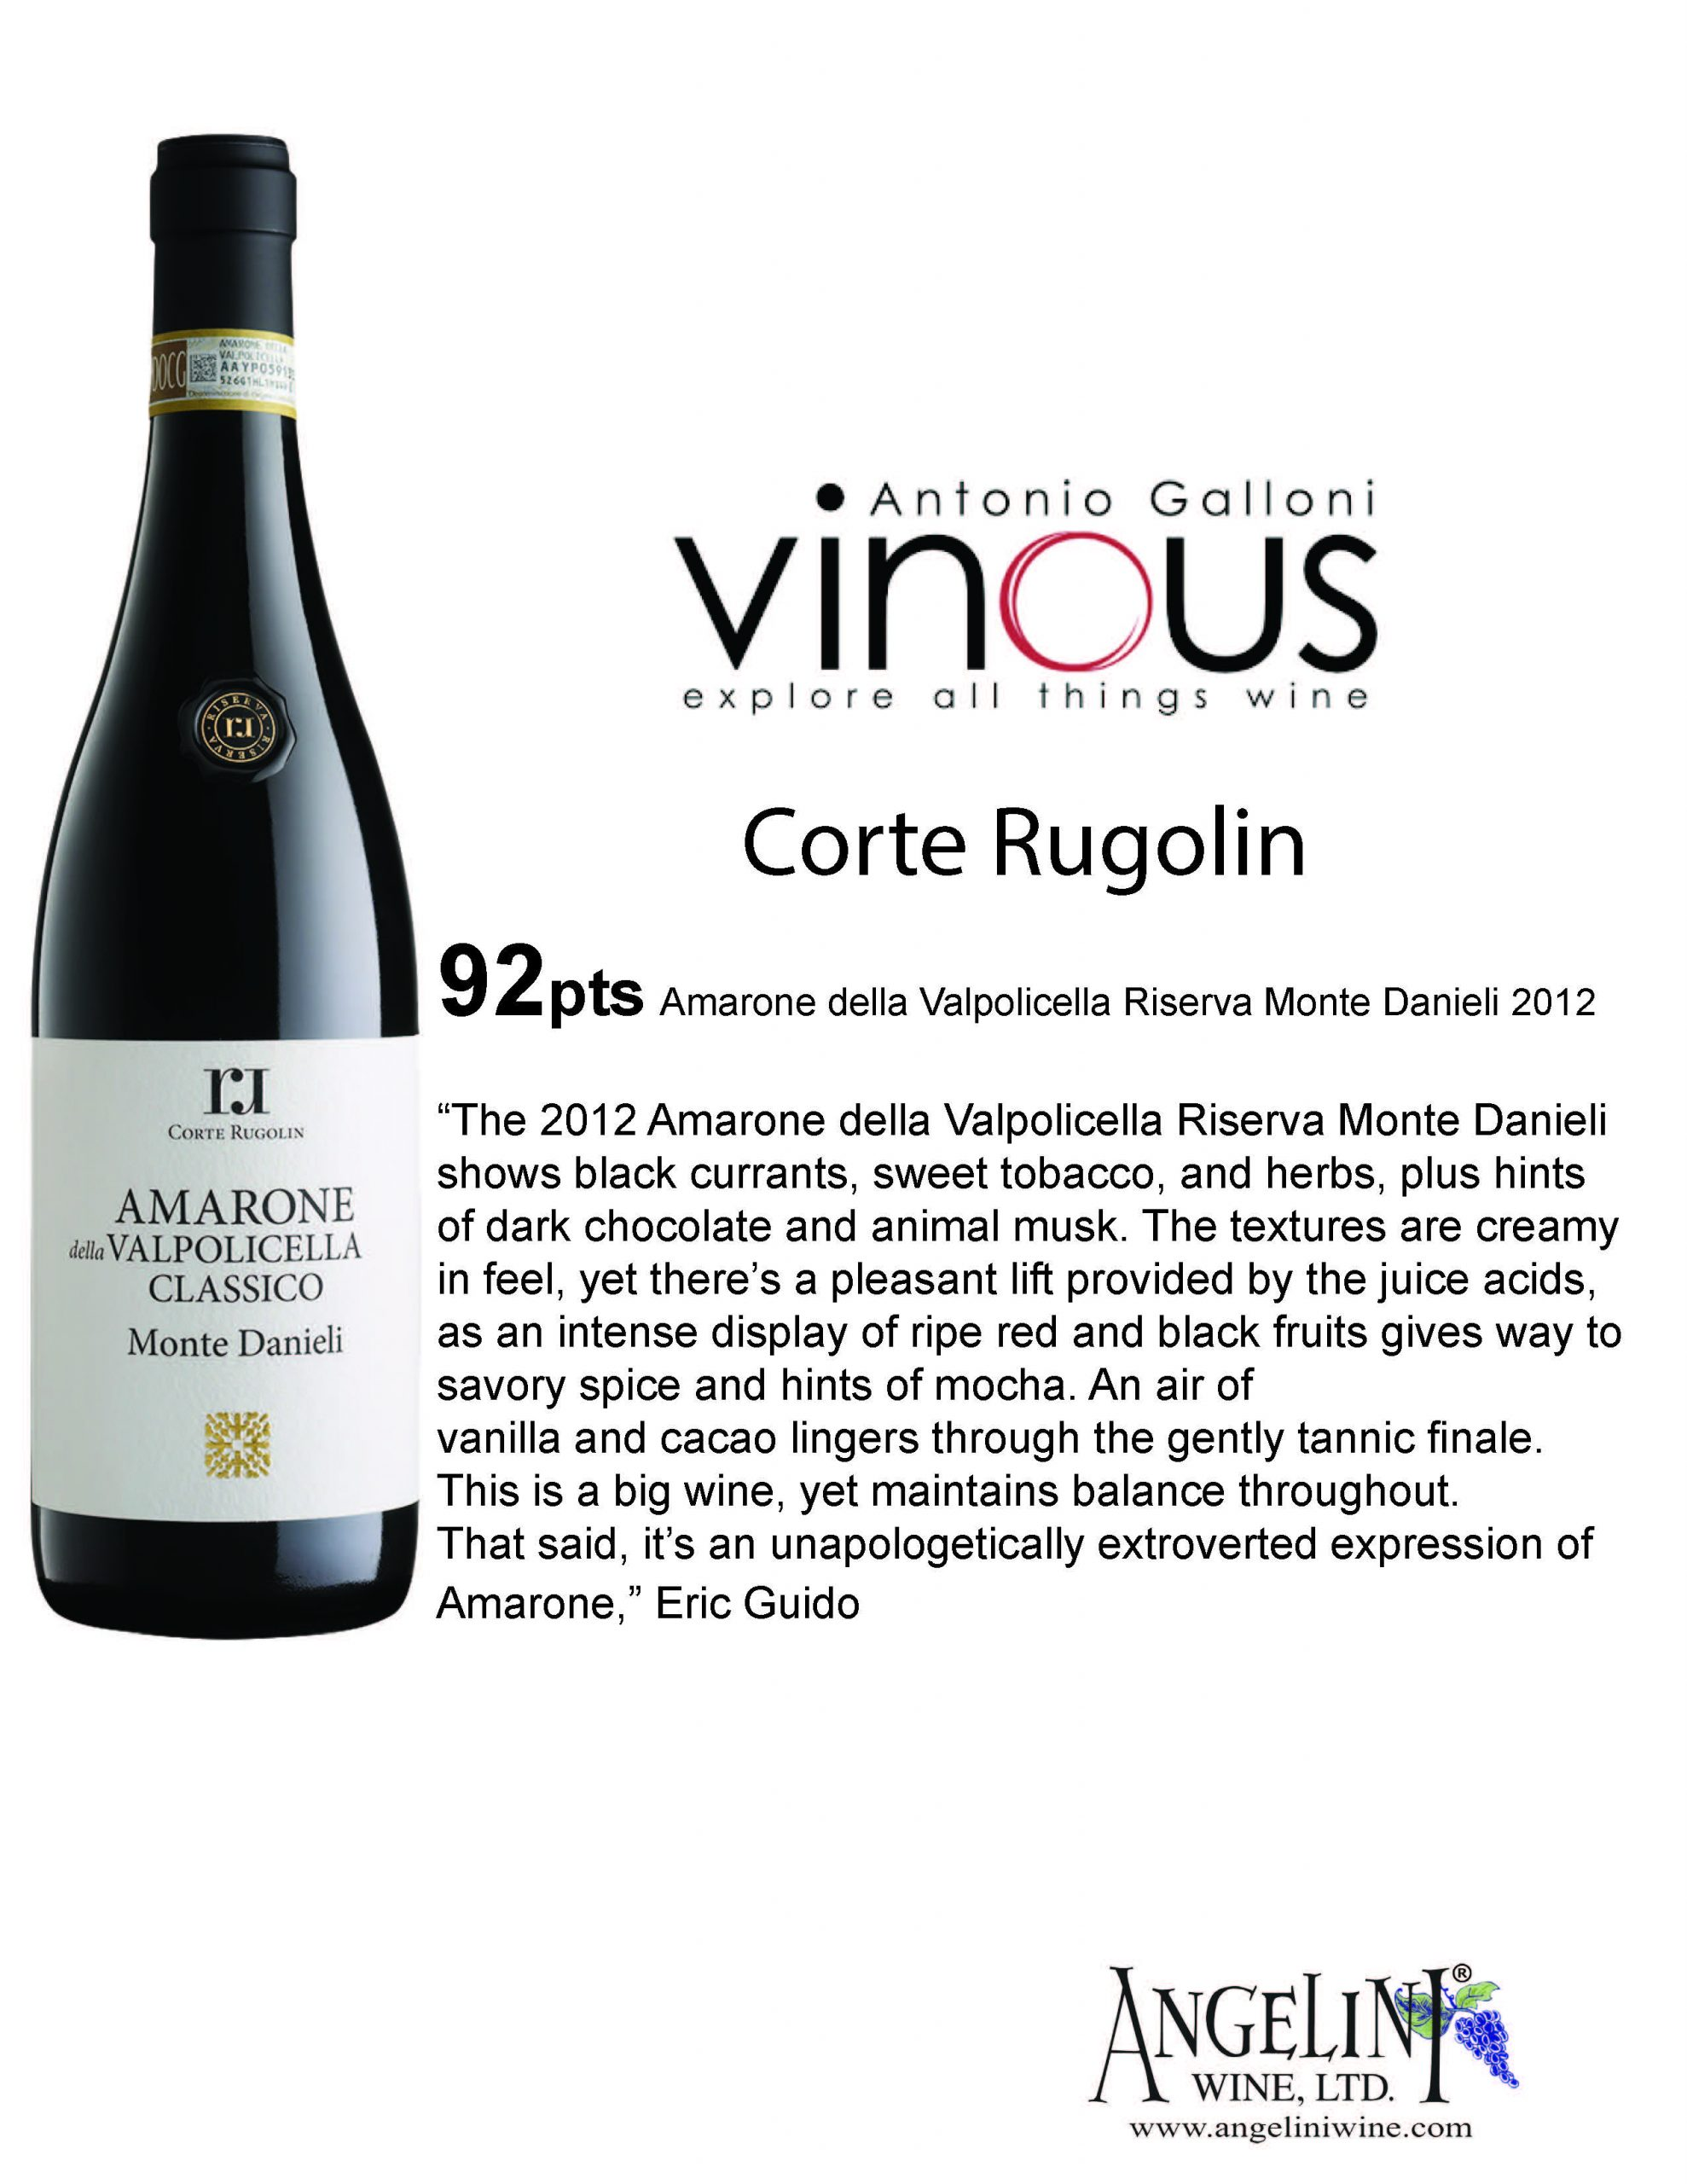 https://www.angeliniwine.com/wp-content/uploads/2021/02/Corte-Rugolin-2012-Amarone-Riseva-Vinous-92-scaled.jpg